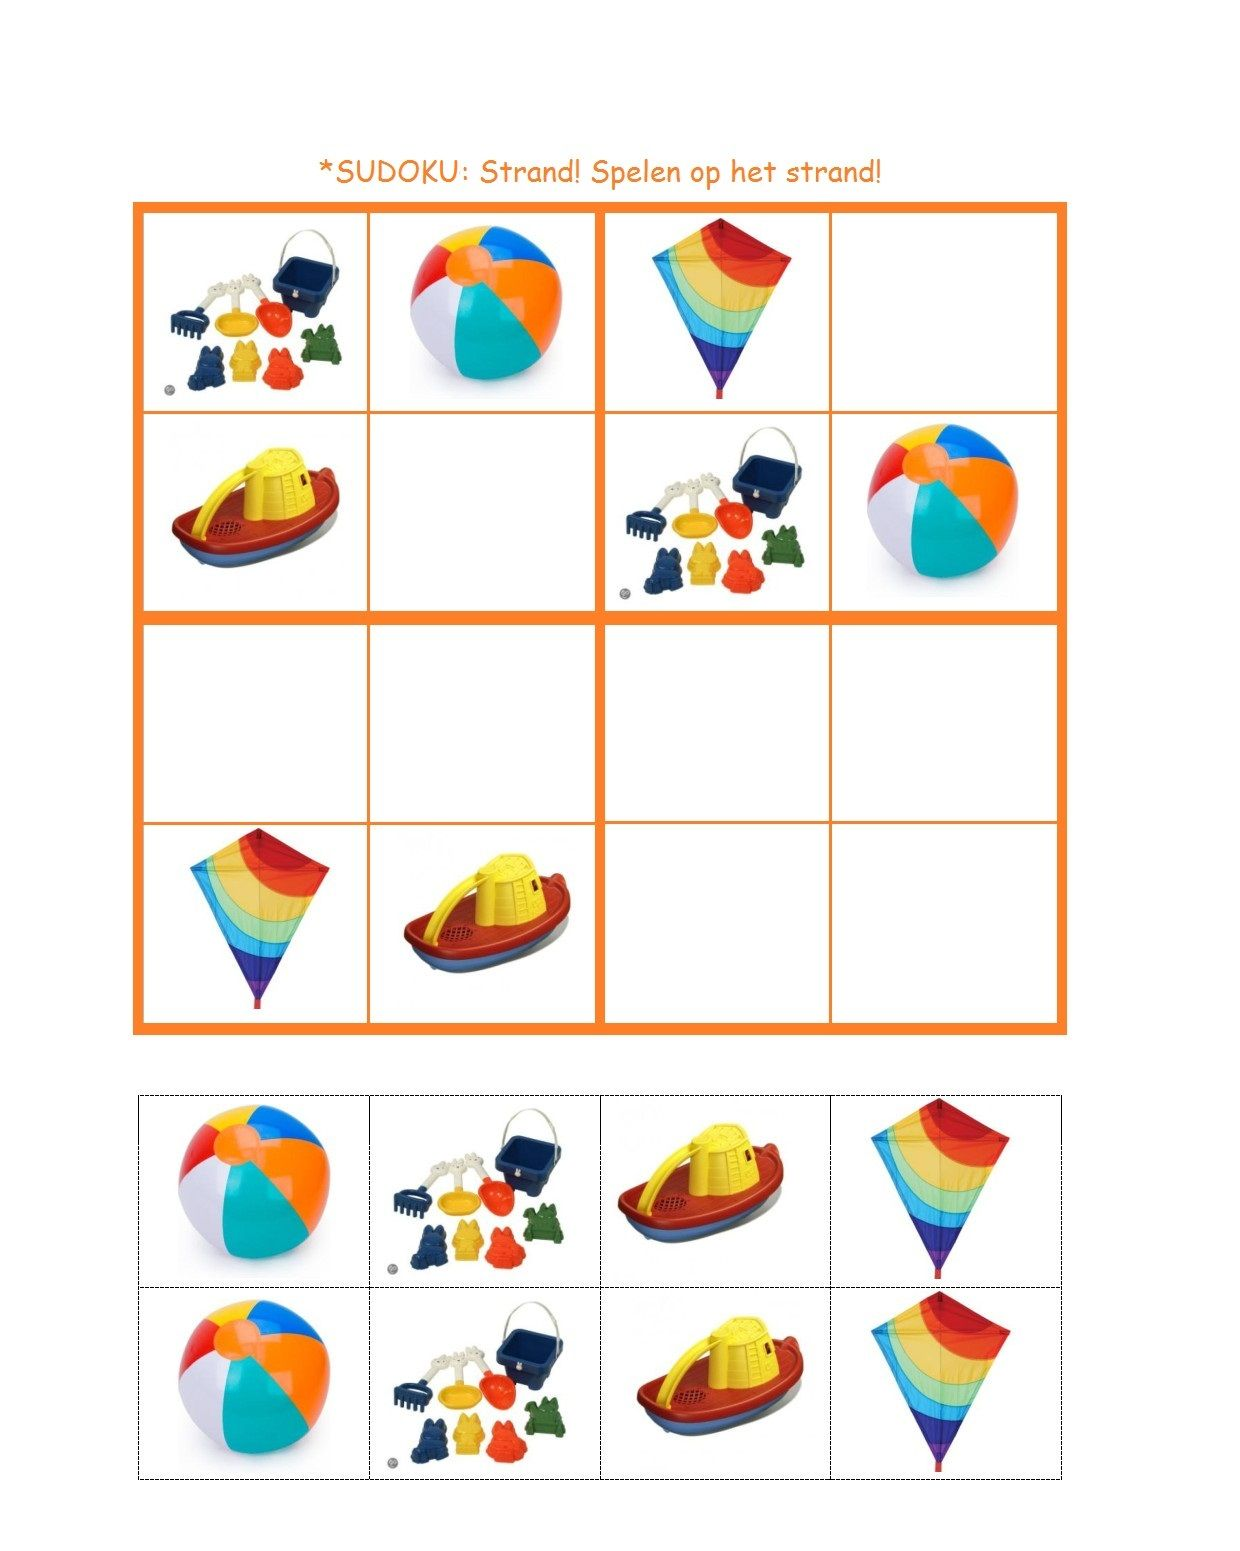 Sodoku Strand Spelen Op Het Strand Sudoku Sudoku Puzzles Puzzles For Kids [ 1551 x 1240 Pixel ]